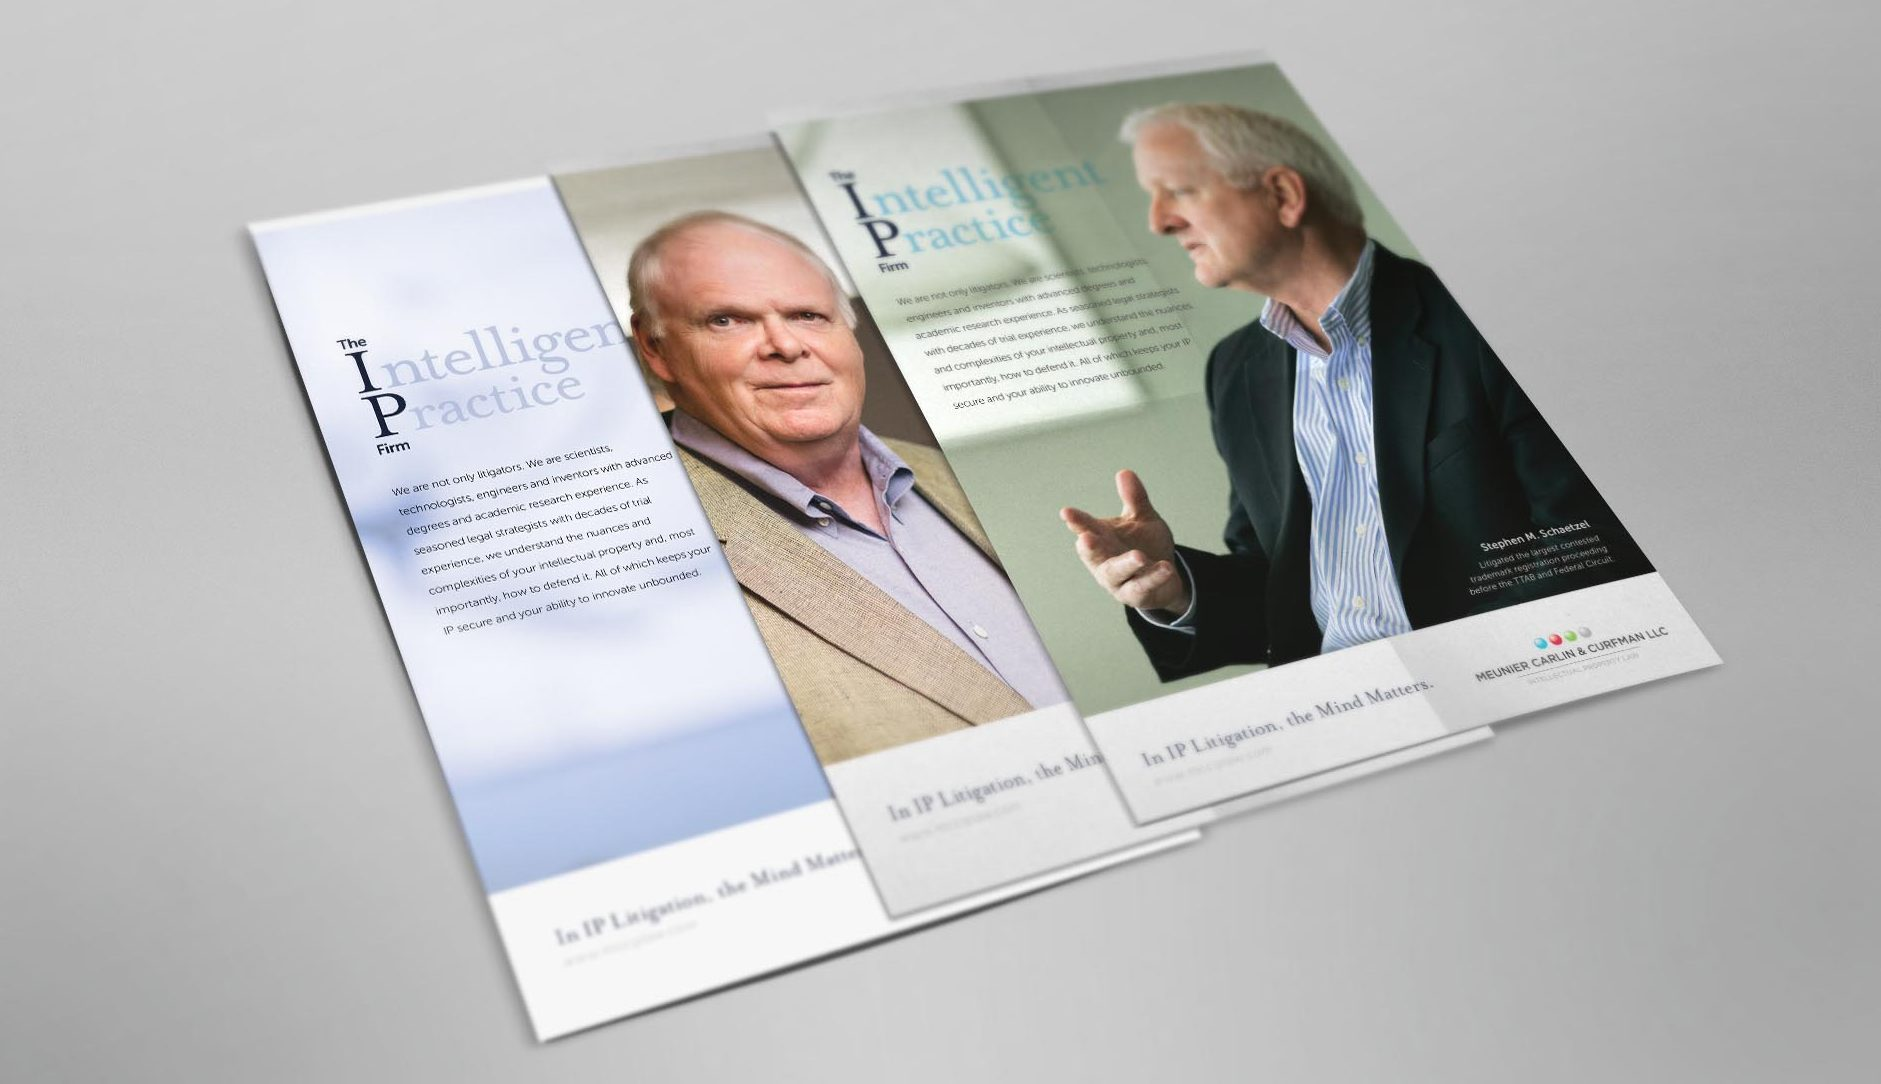 Meunier Carlin & Curfman Advertisements